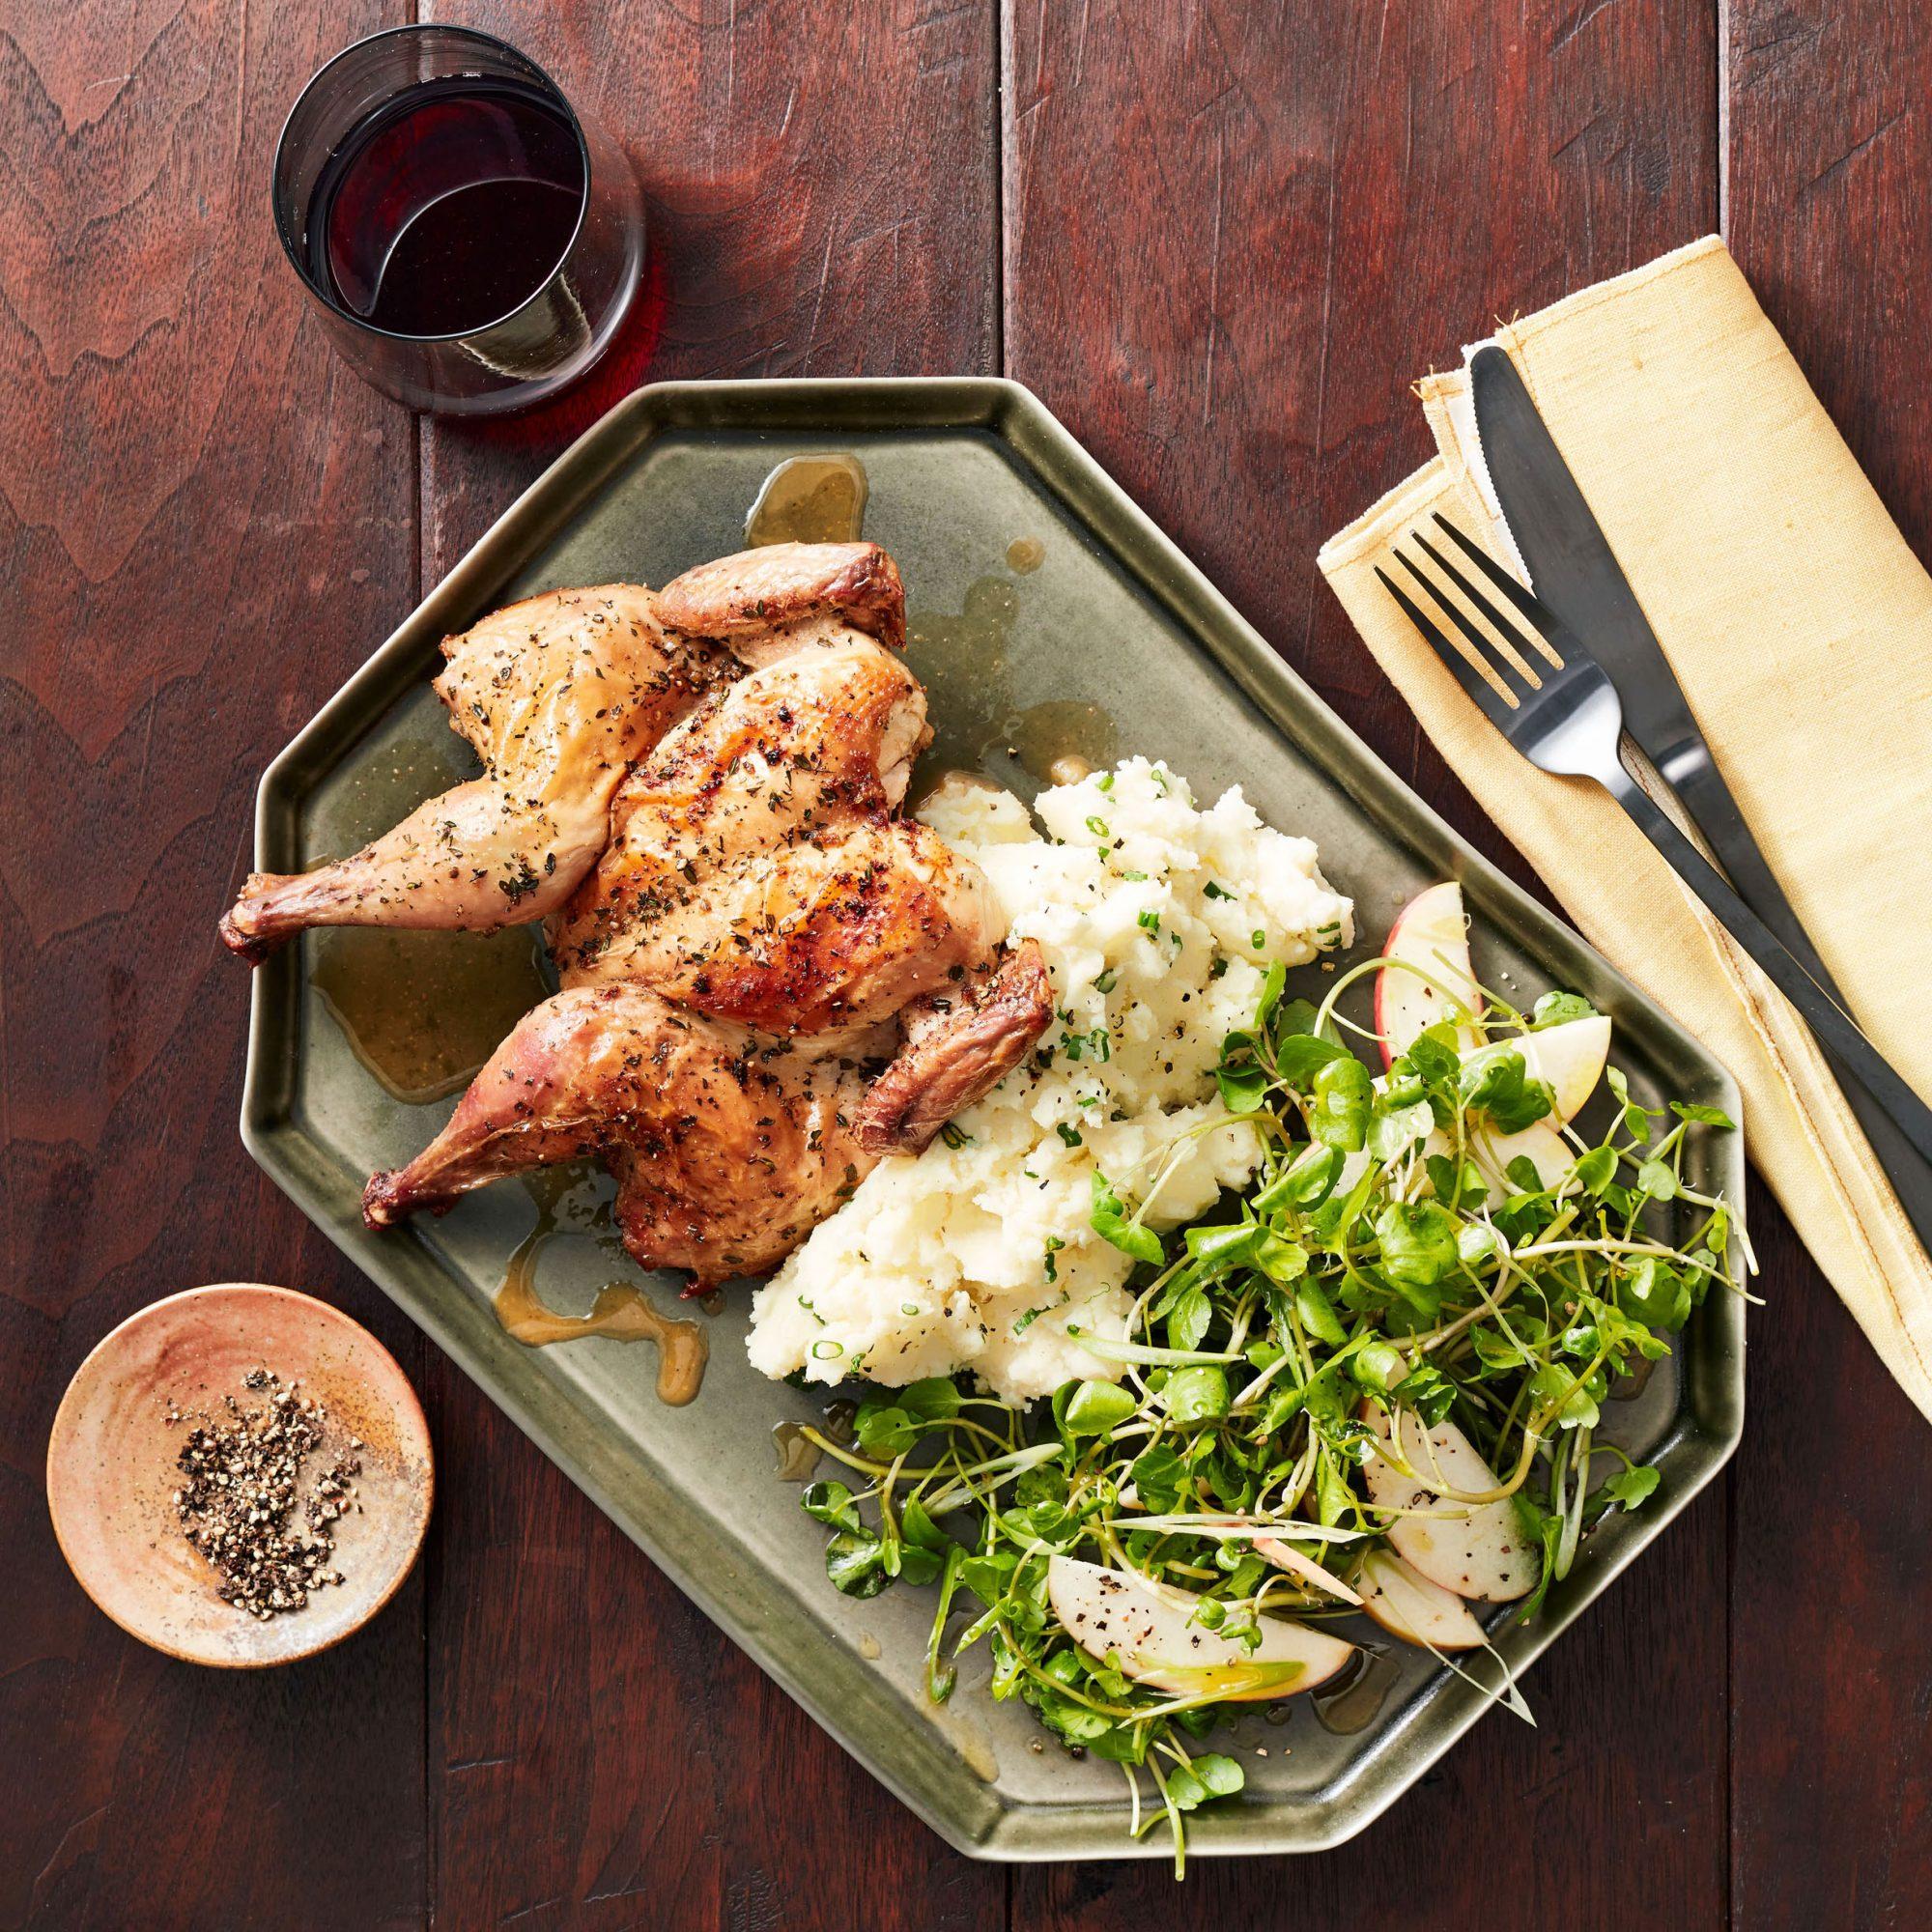 Cornish Hens, Horseradish-Cheddar Potatoes & Cress Salad with Apples